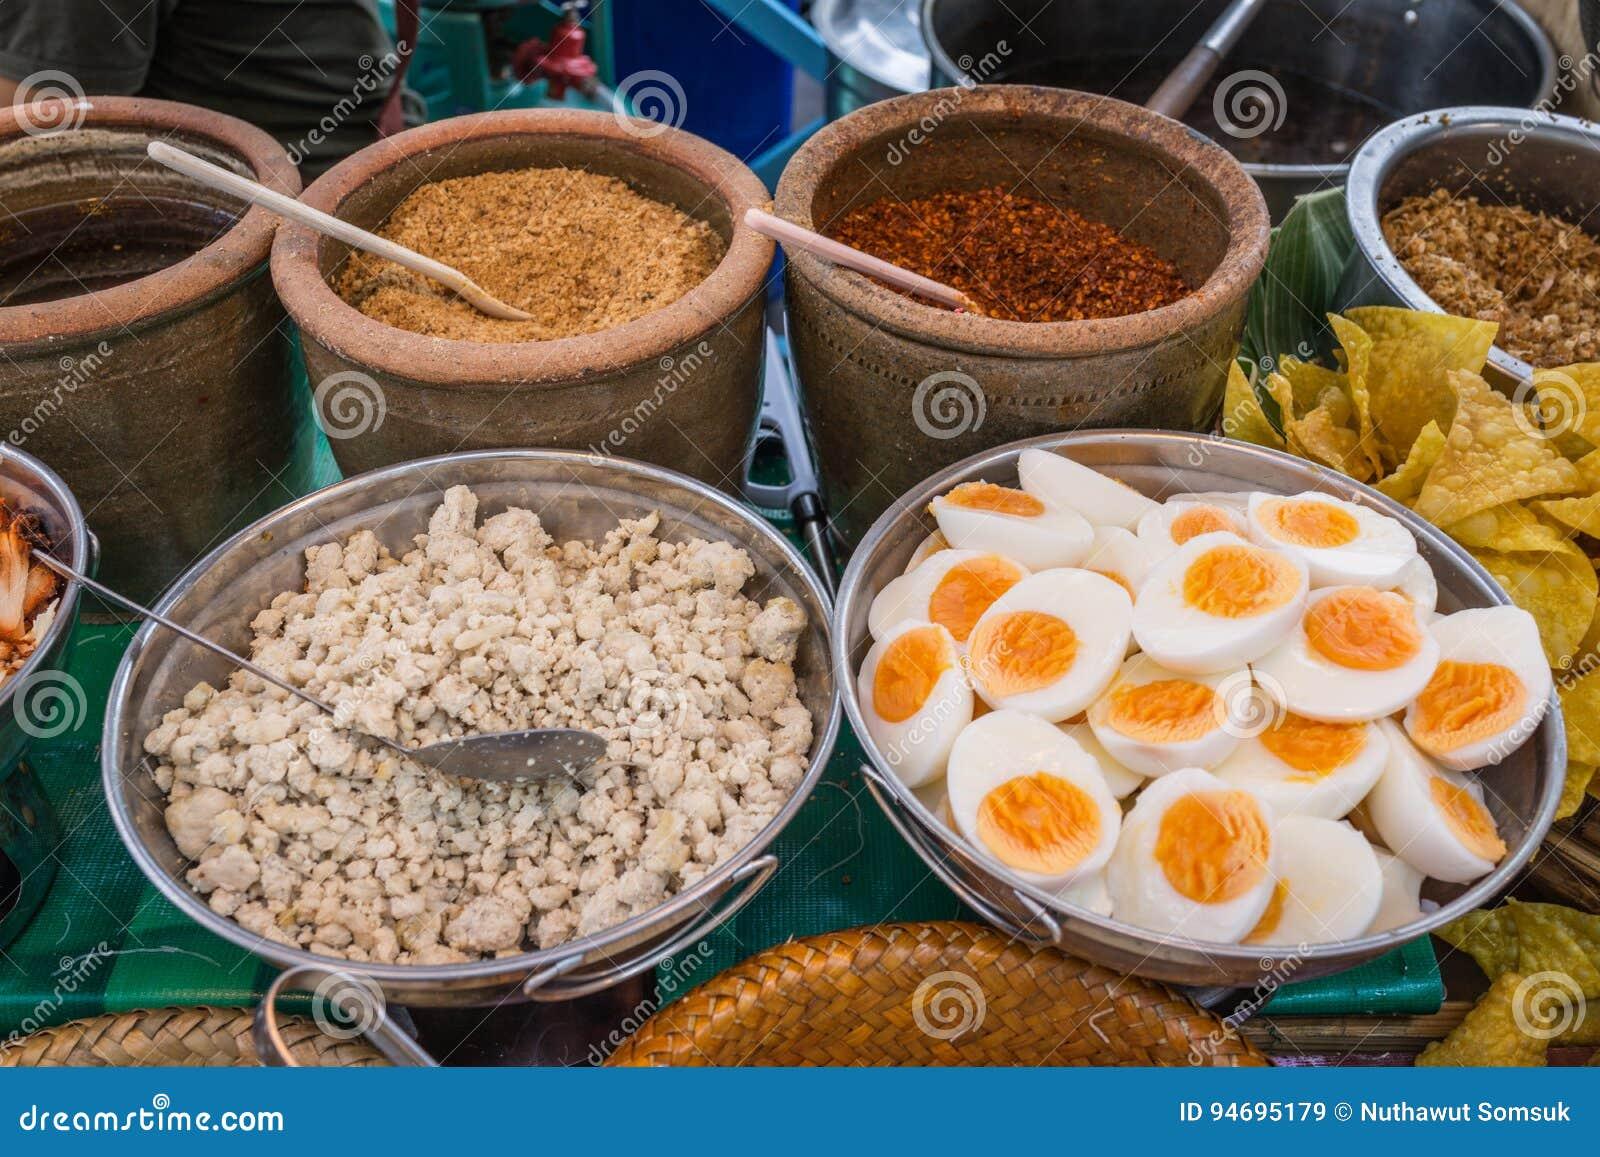 skinny-suicide-thai-asian-food-market-glover-pornstar-nude